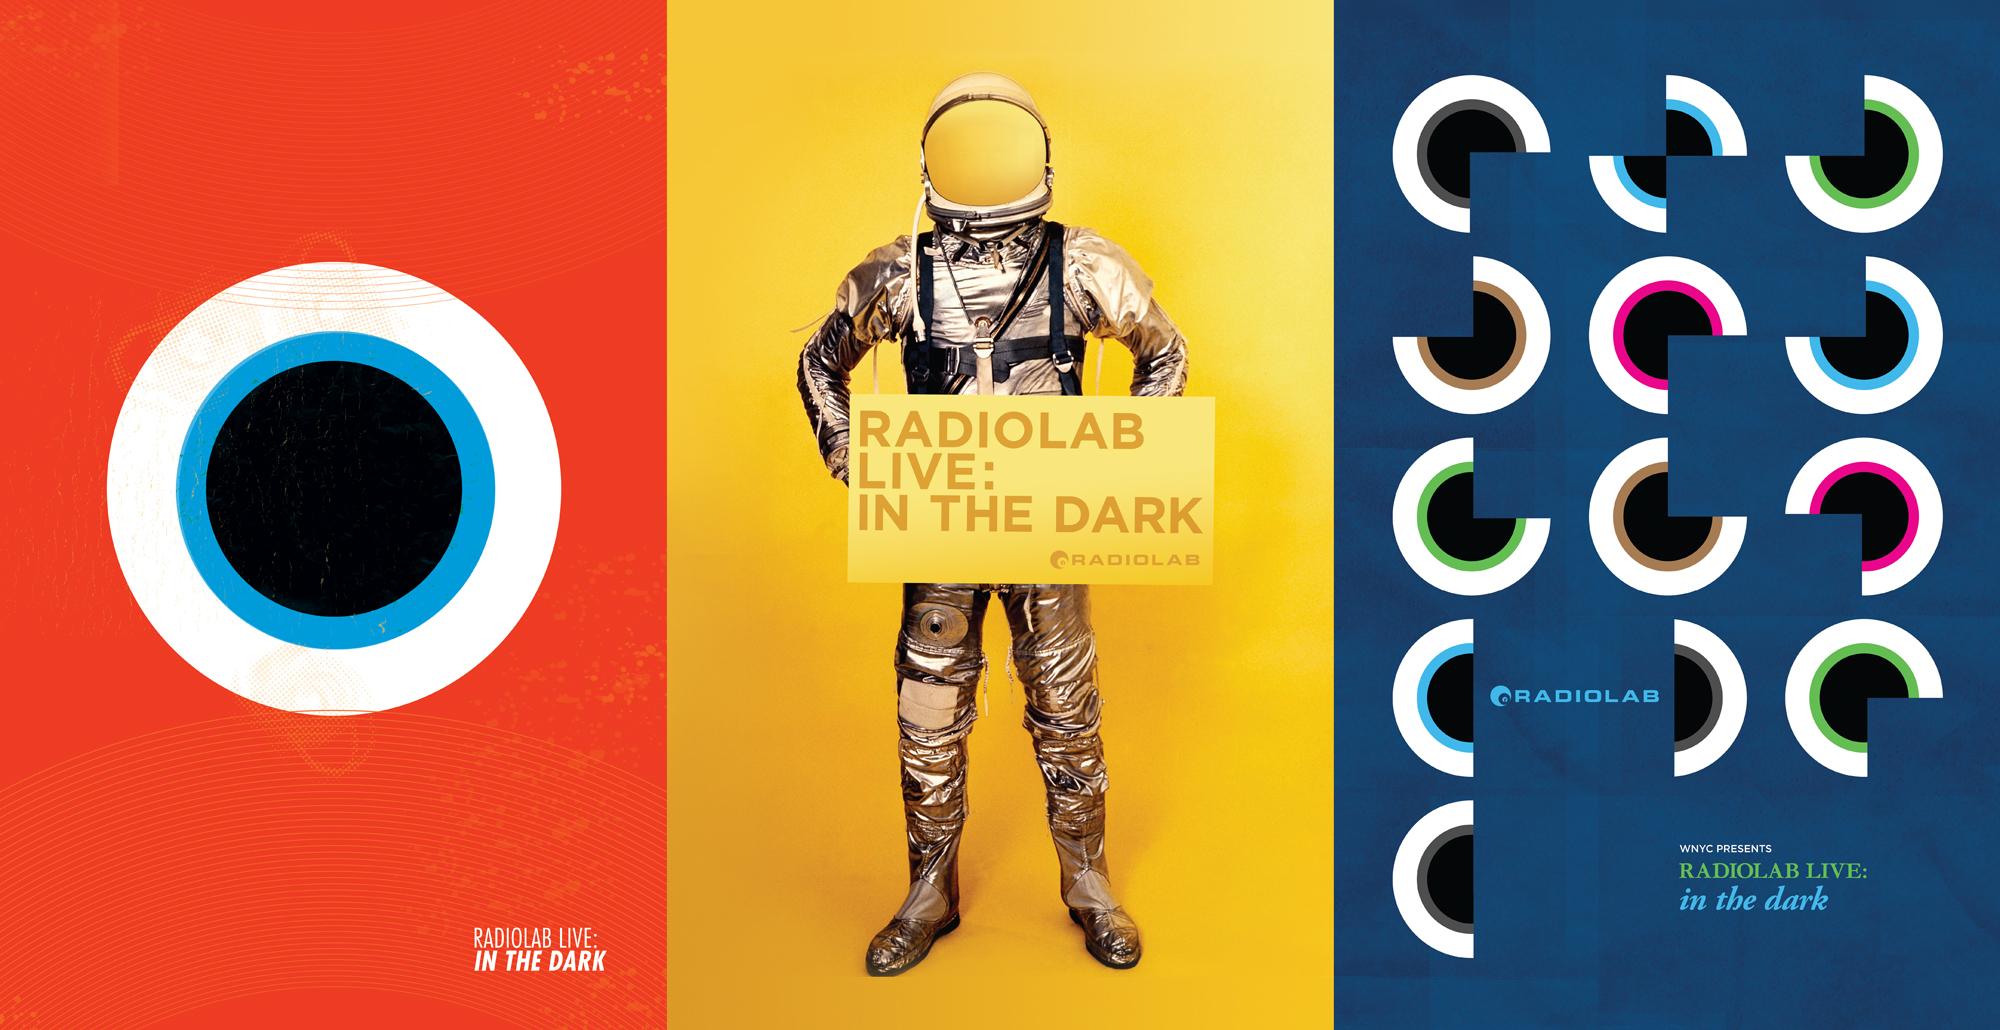 WNYC Radiolab posters